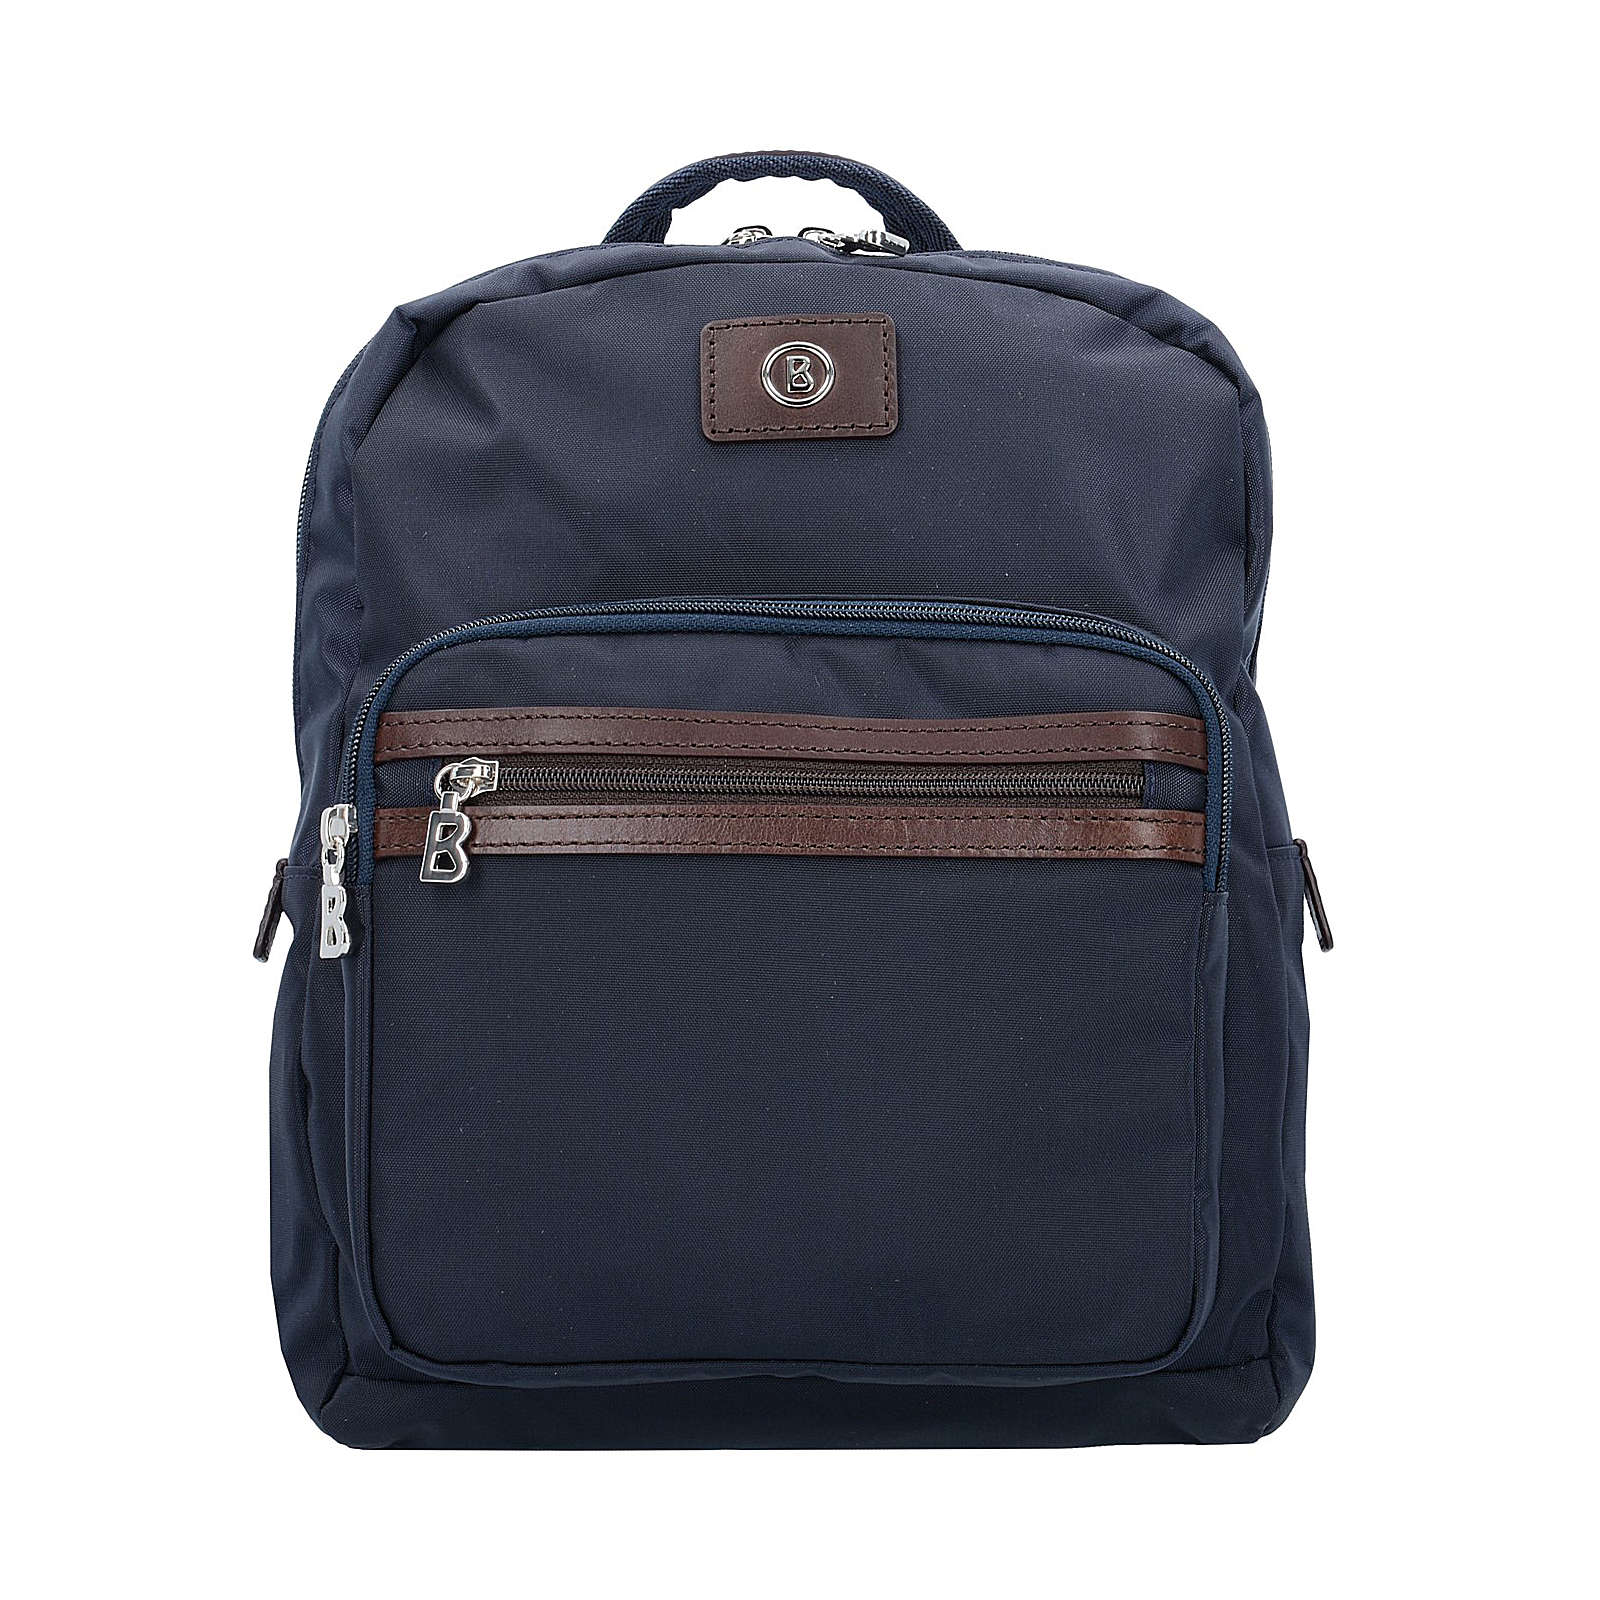 bogner elba backpack 3 rucksack 33 cm rucks cke blau g nstig schnell einkaufen. Black Bedroom Furniture Sets. Home Design Ideas